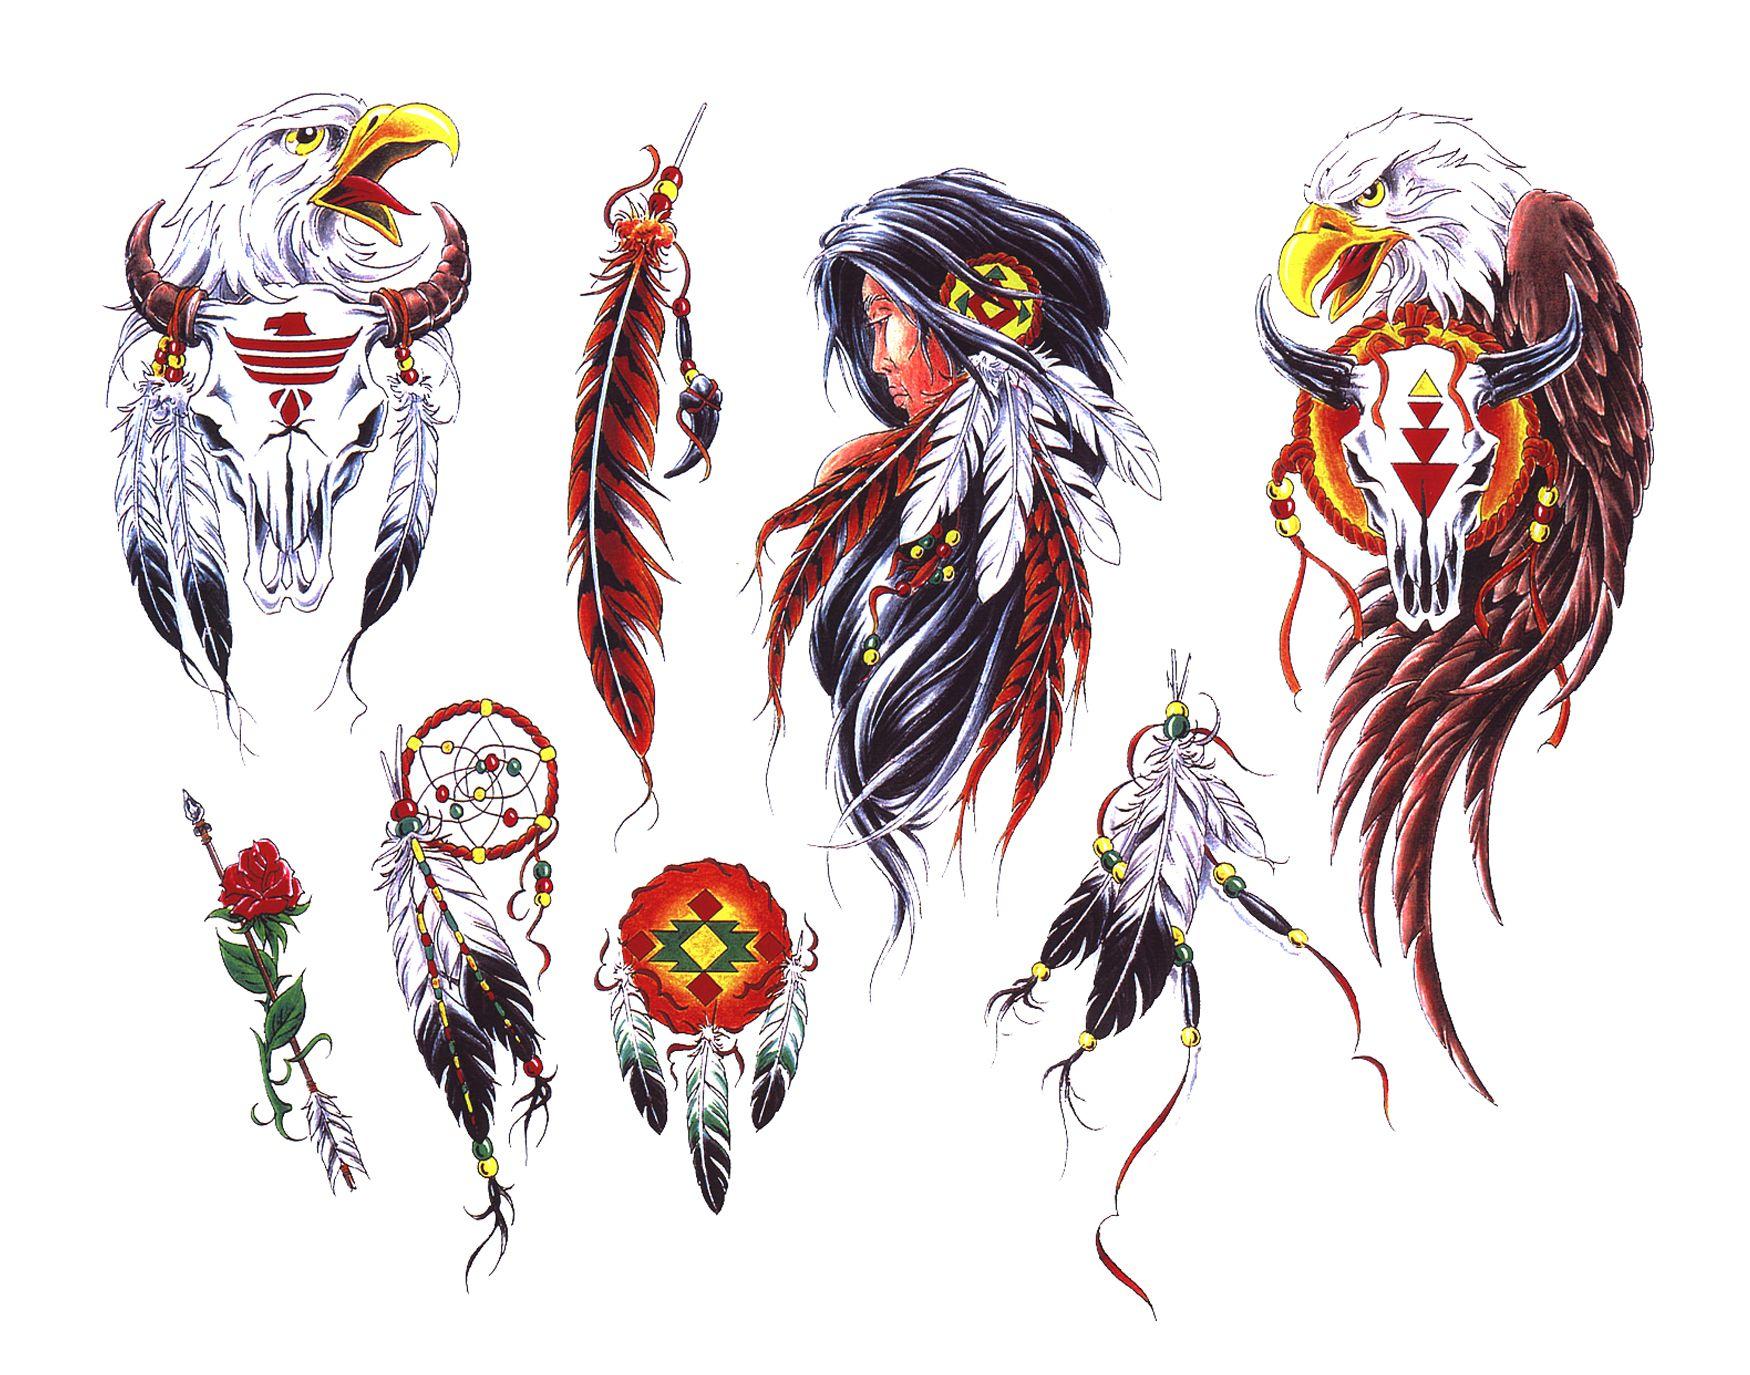 All about art tattoo studio flash art upstairs 5 good street native american symbols hindu symbols tattoos indian symbols and biocorpaavc Choice Image